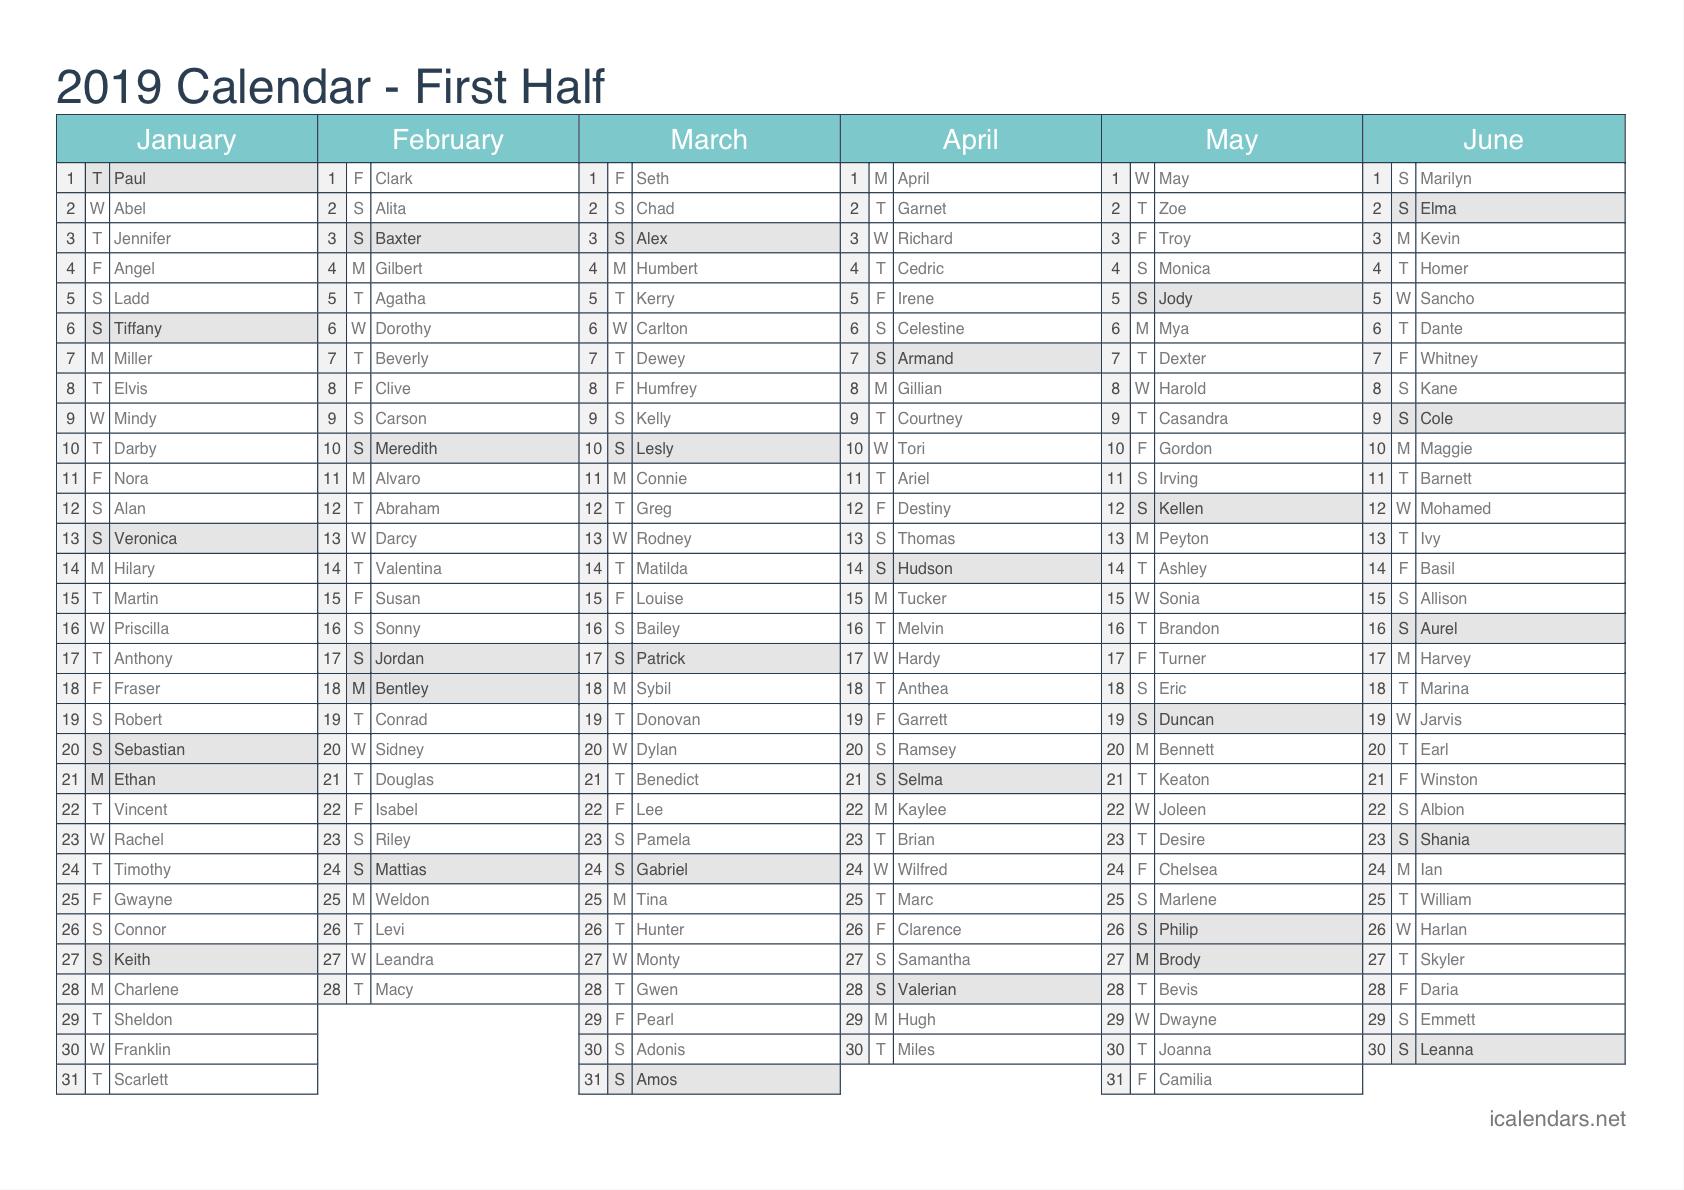 2019 Printable Calendar - Pdf Or Excel - Icalendars Calendar 2019 Year Excel